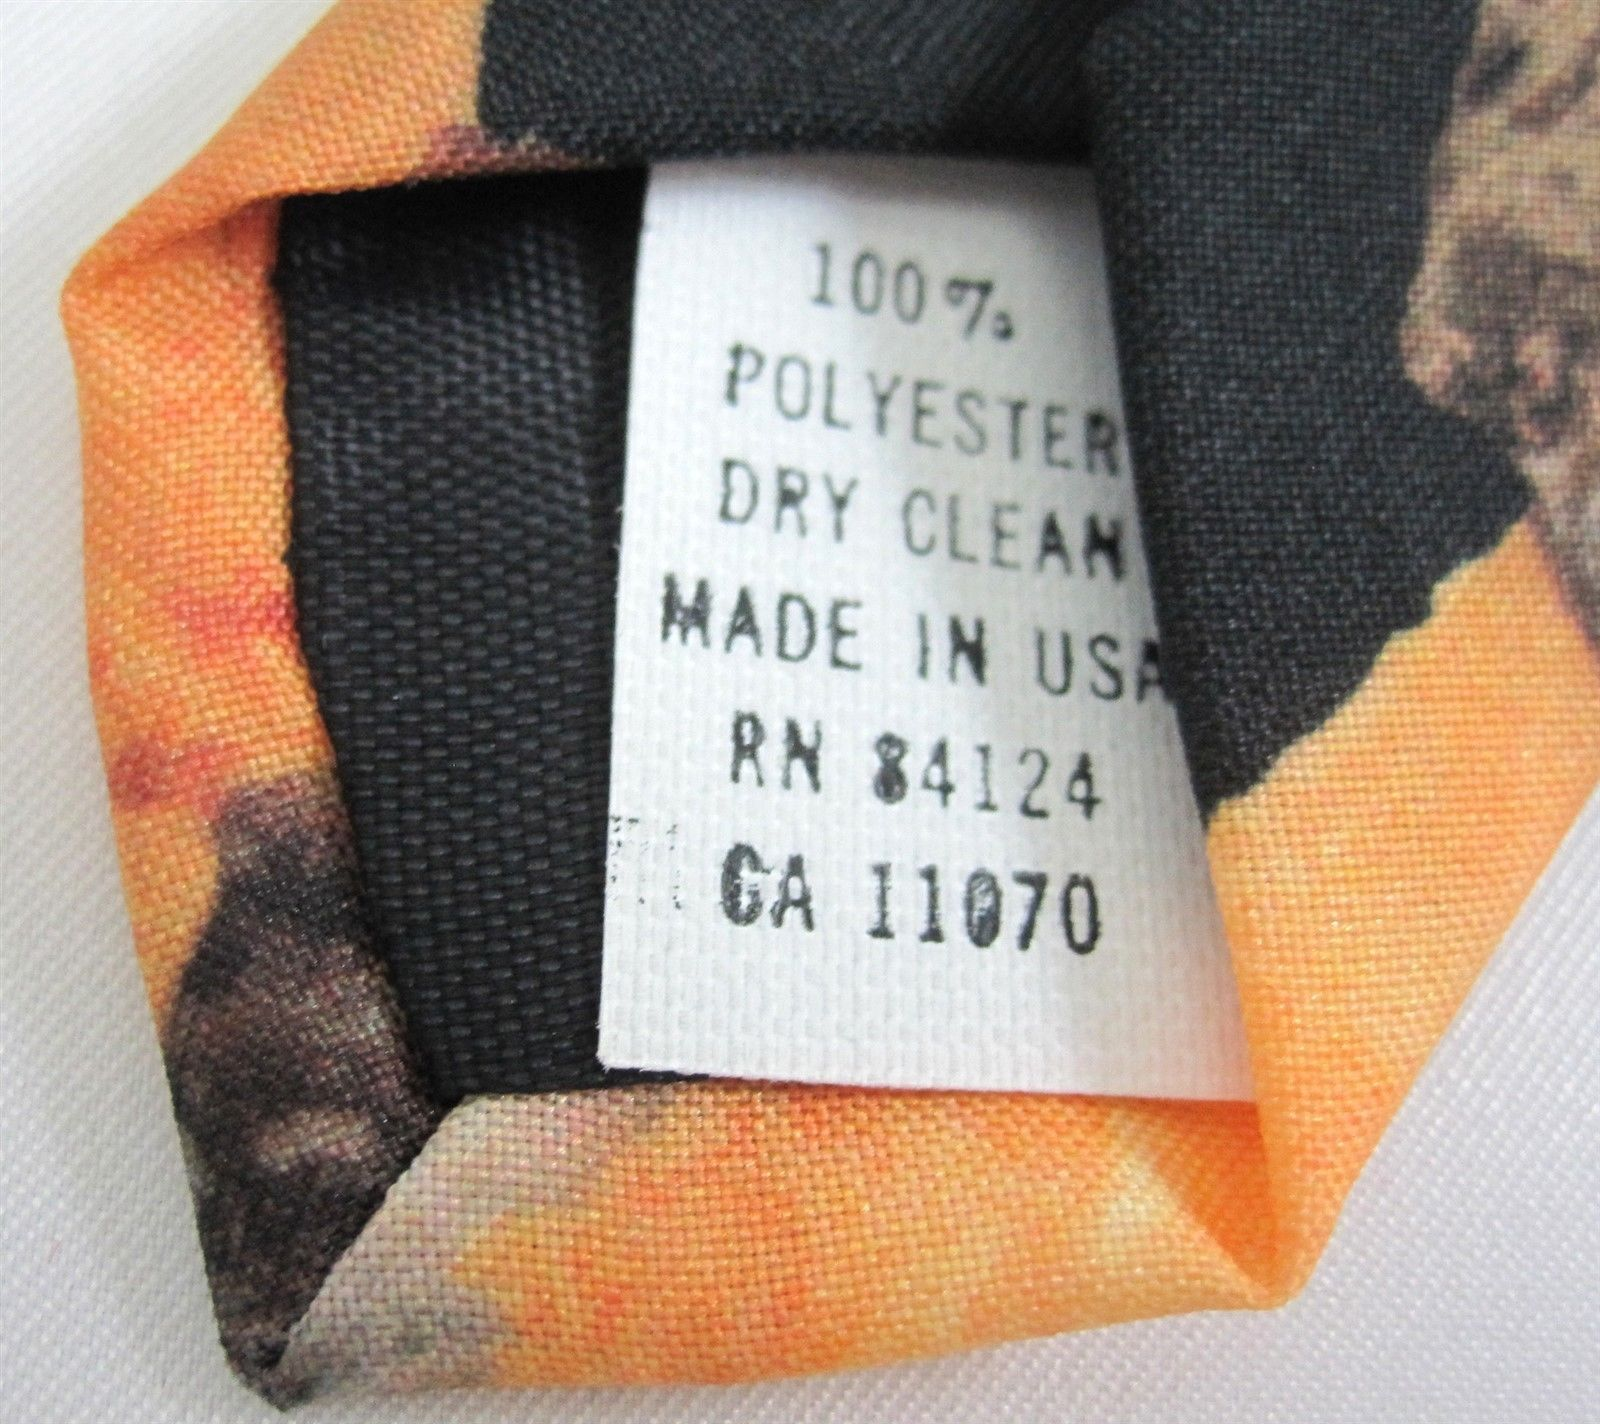 Ice Cream Cone Necktie Neck Tie Ralph Marlin & Co. 151139 Made in USA 1997